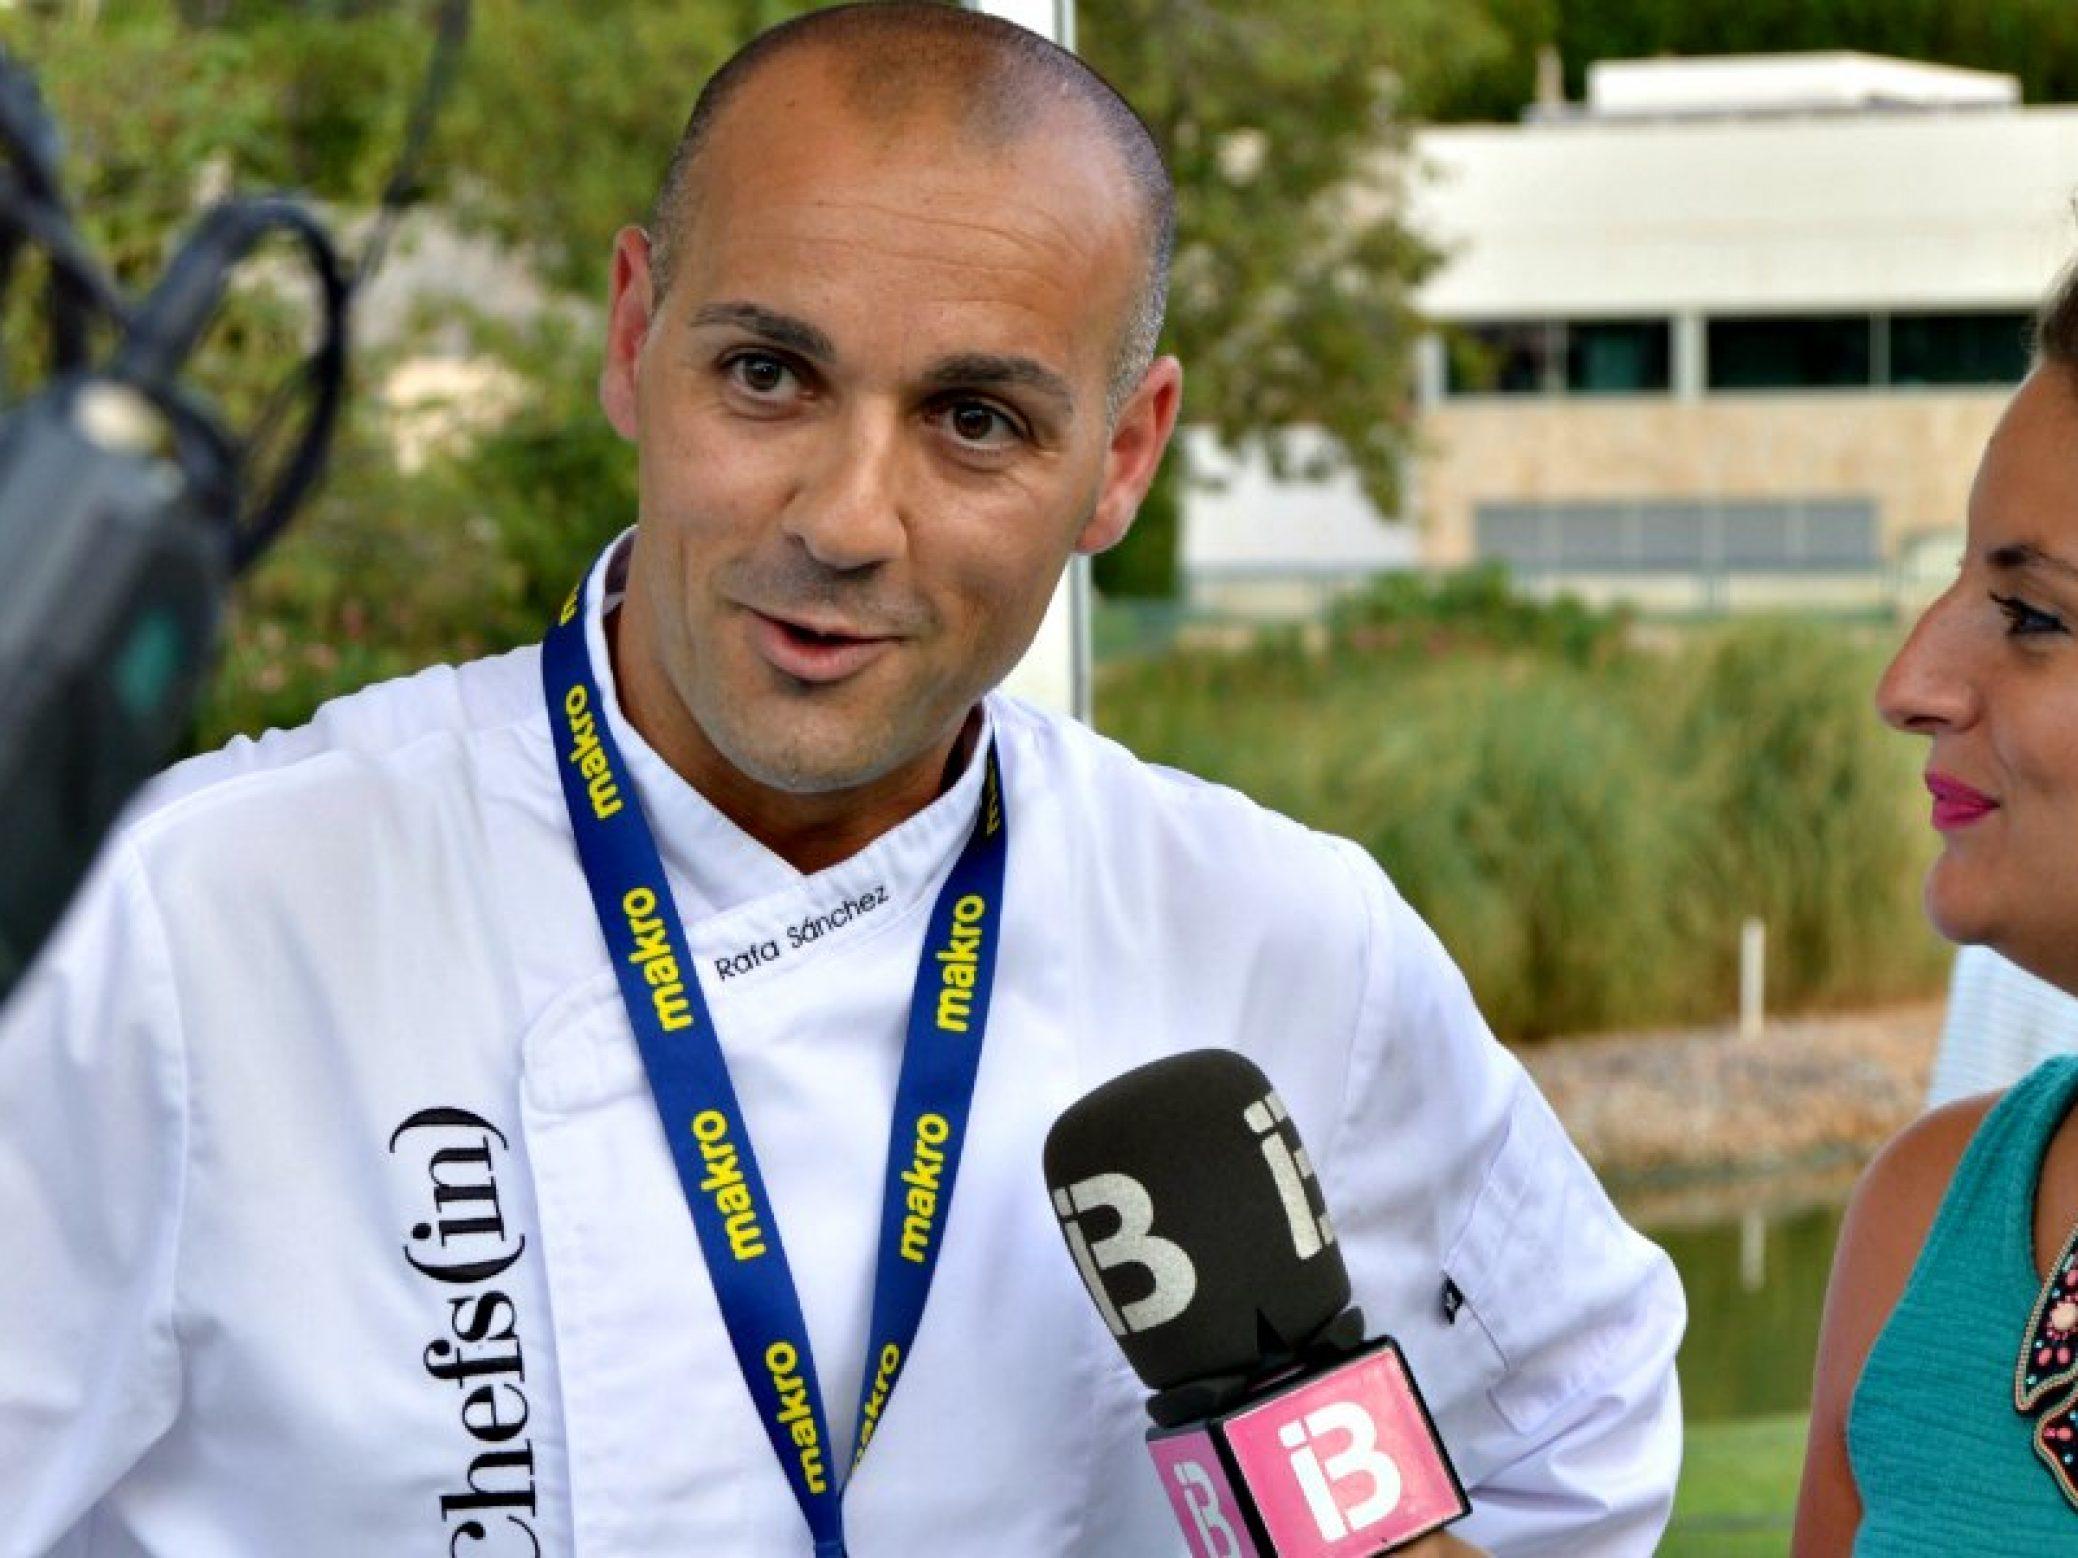 Rafa Sánchez, new executive chef at PortBlue Hotels & Resorts